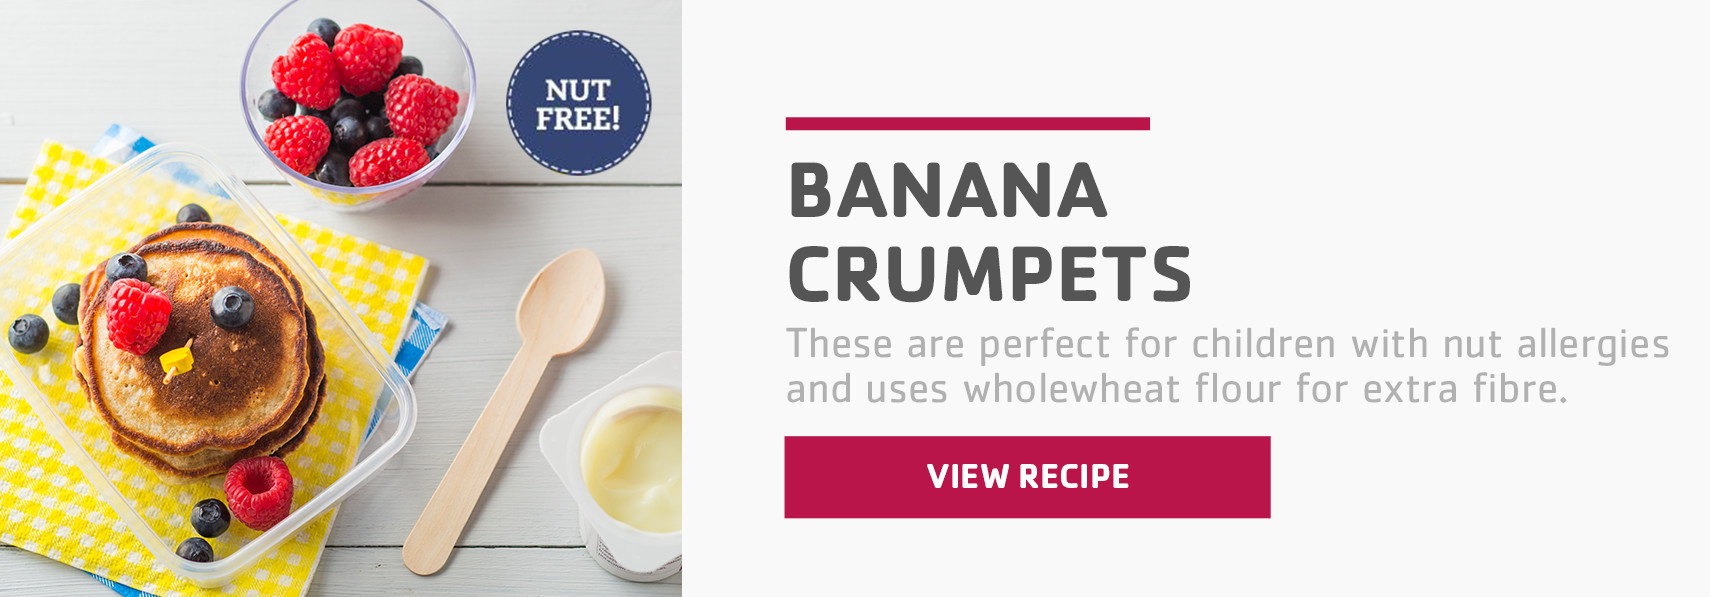 01_Lunchbox-Banana_crumpets.jpg